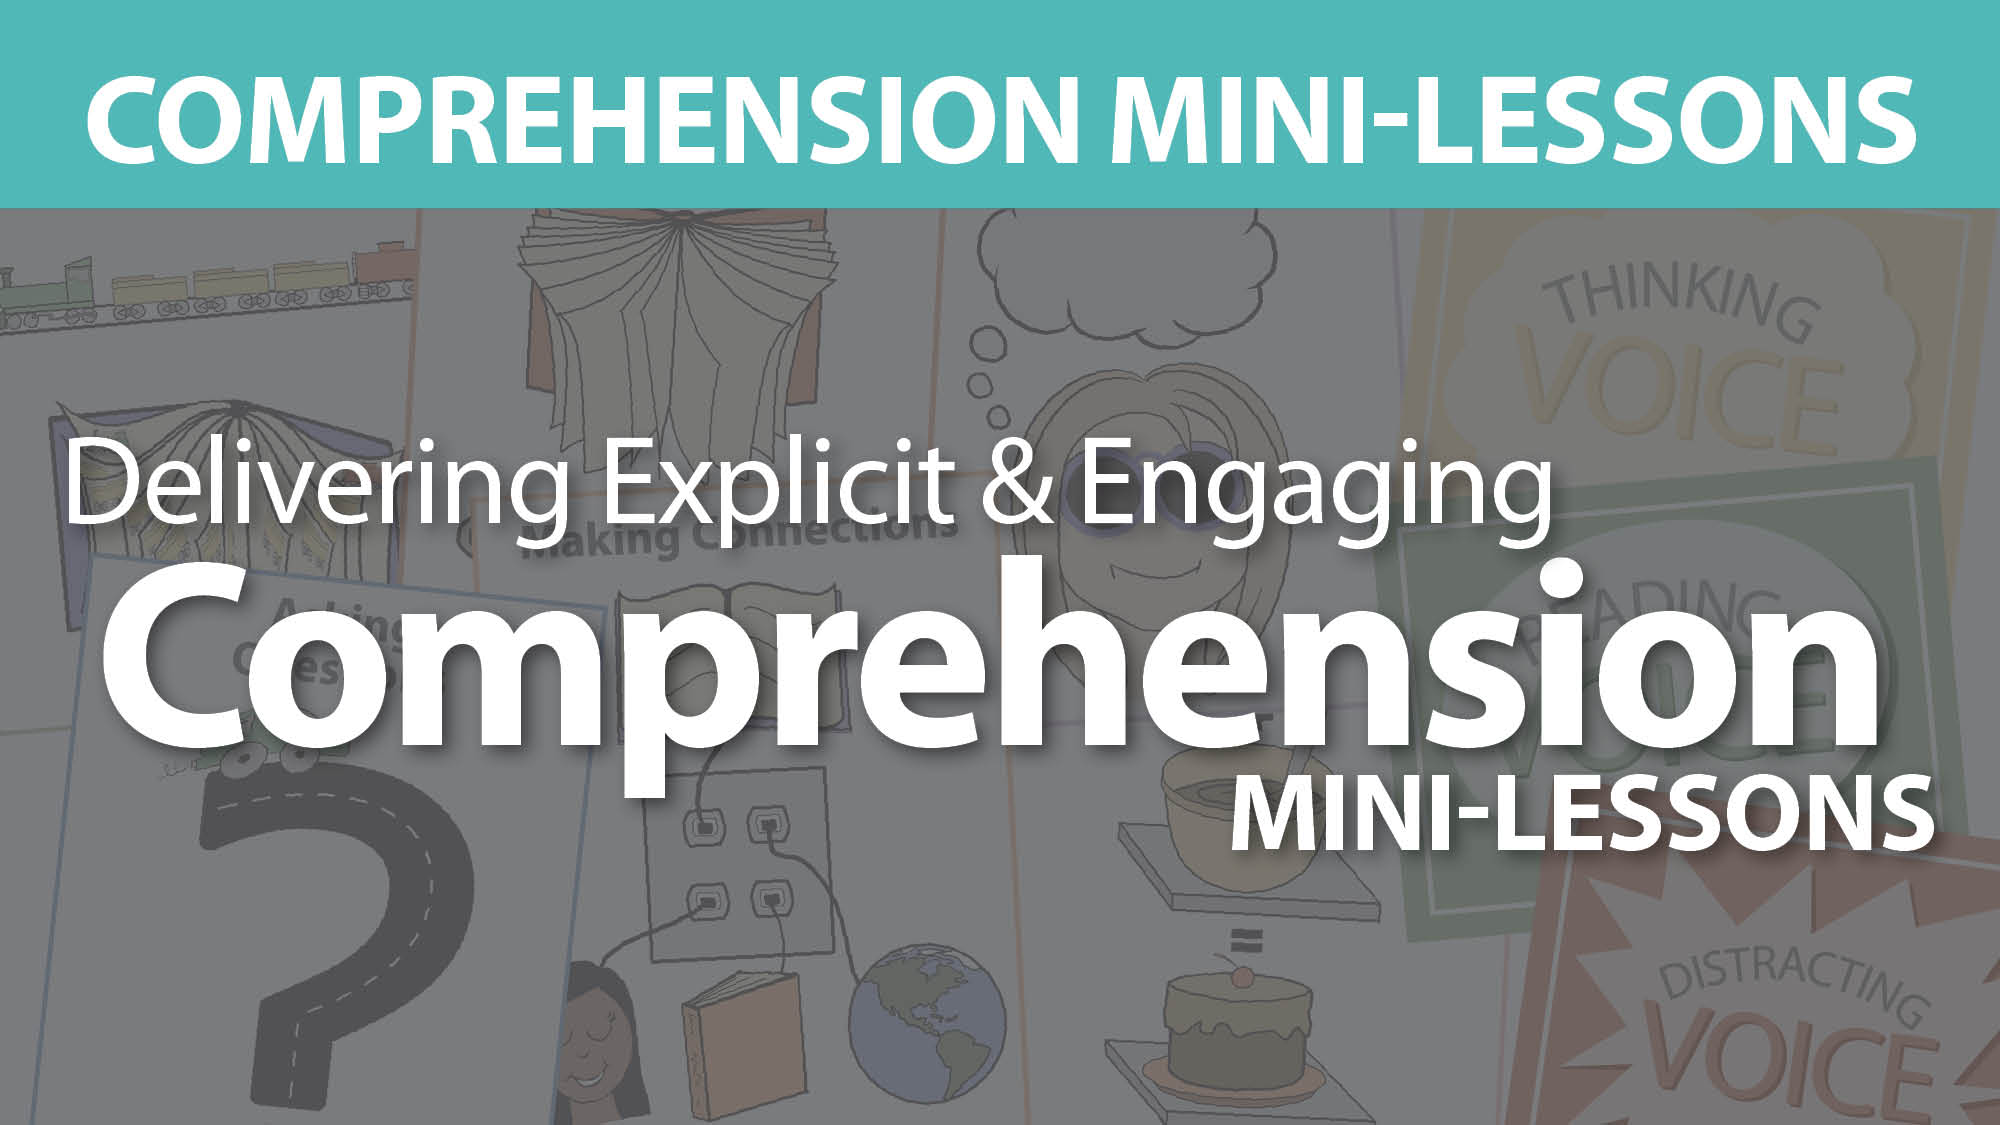 Delivering Explicit & Engaging Comprehension Mini-Lessons Secret Site